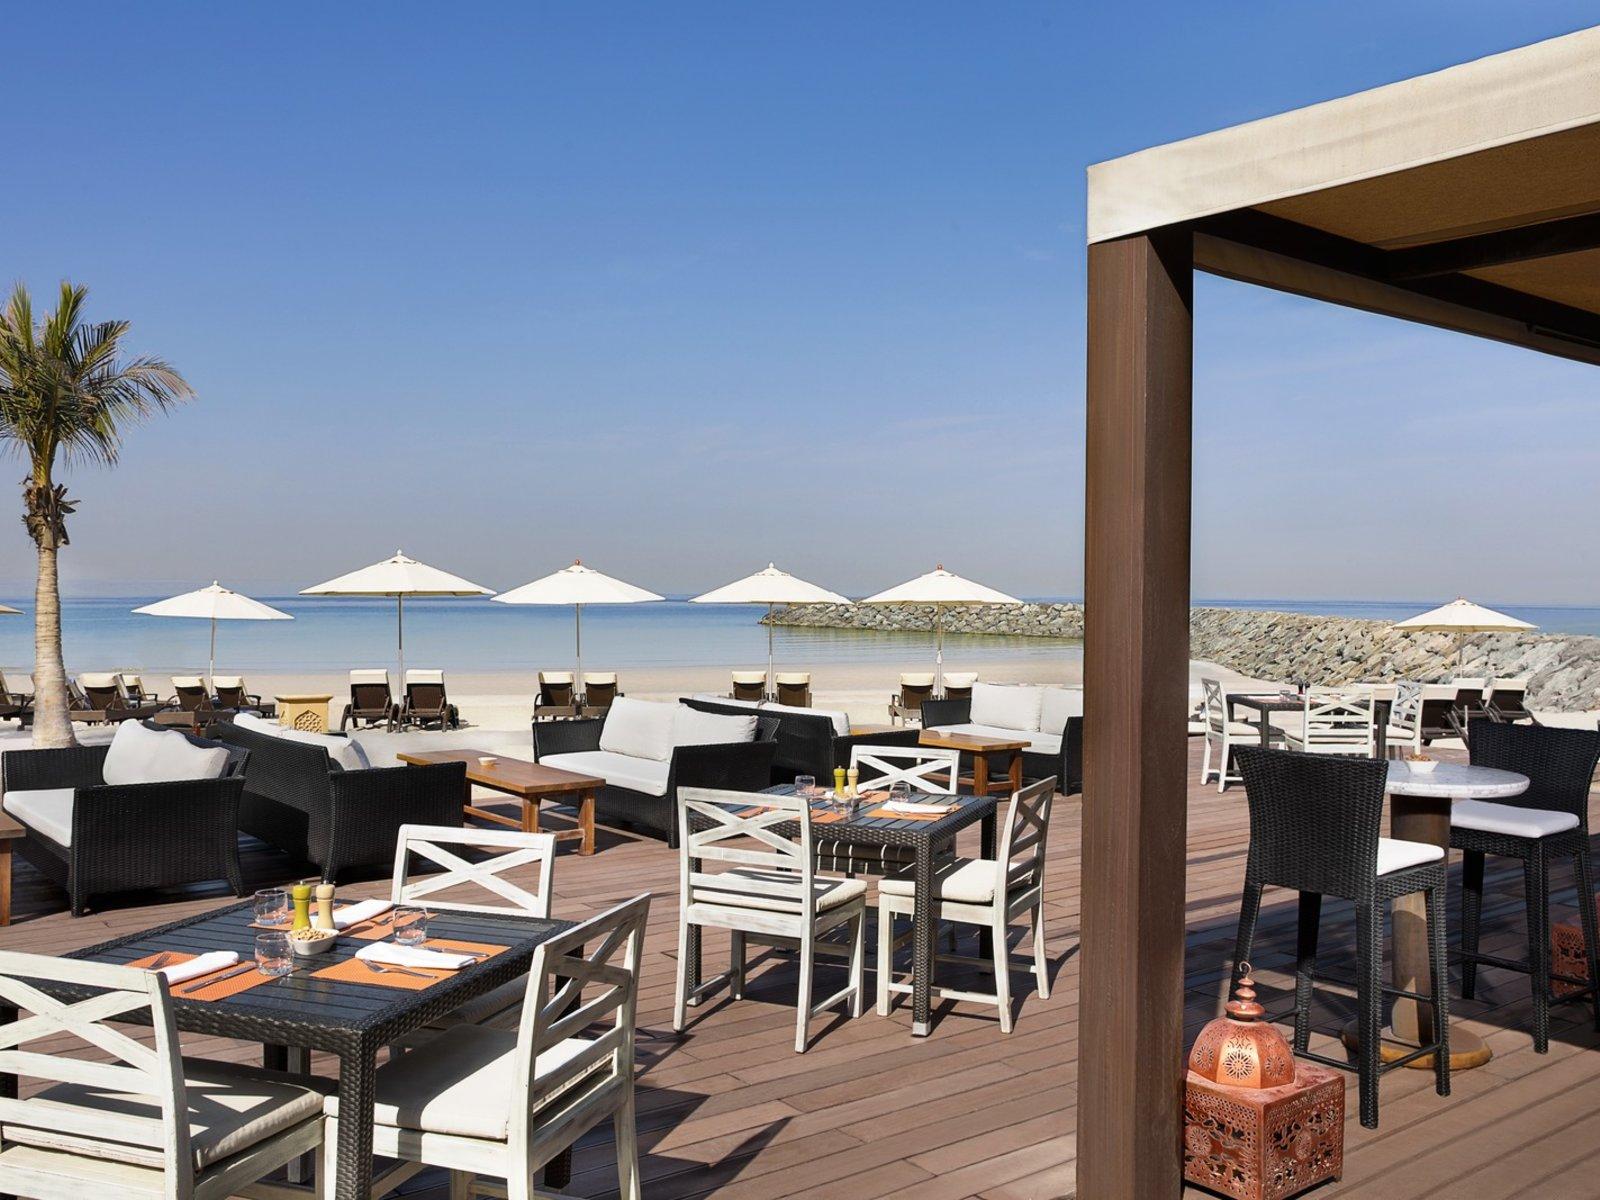 Bab Al Bahr Beach Bar & Grill